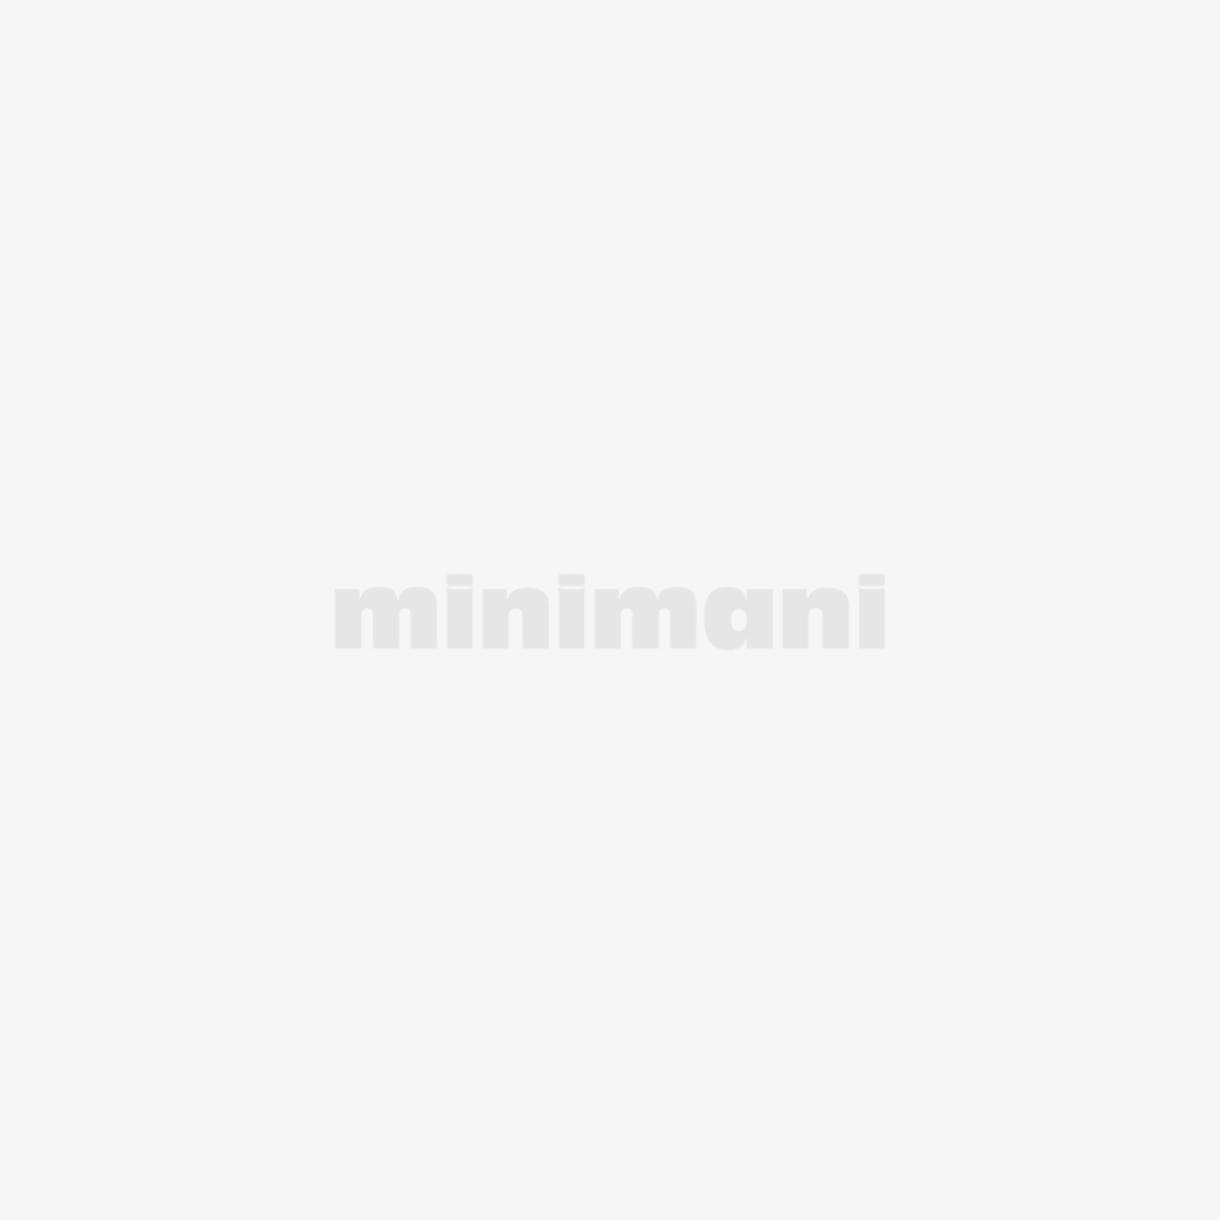 North Outdoor Active merinopaita, lasten 110/116